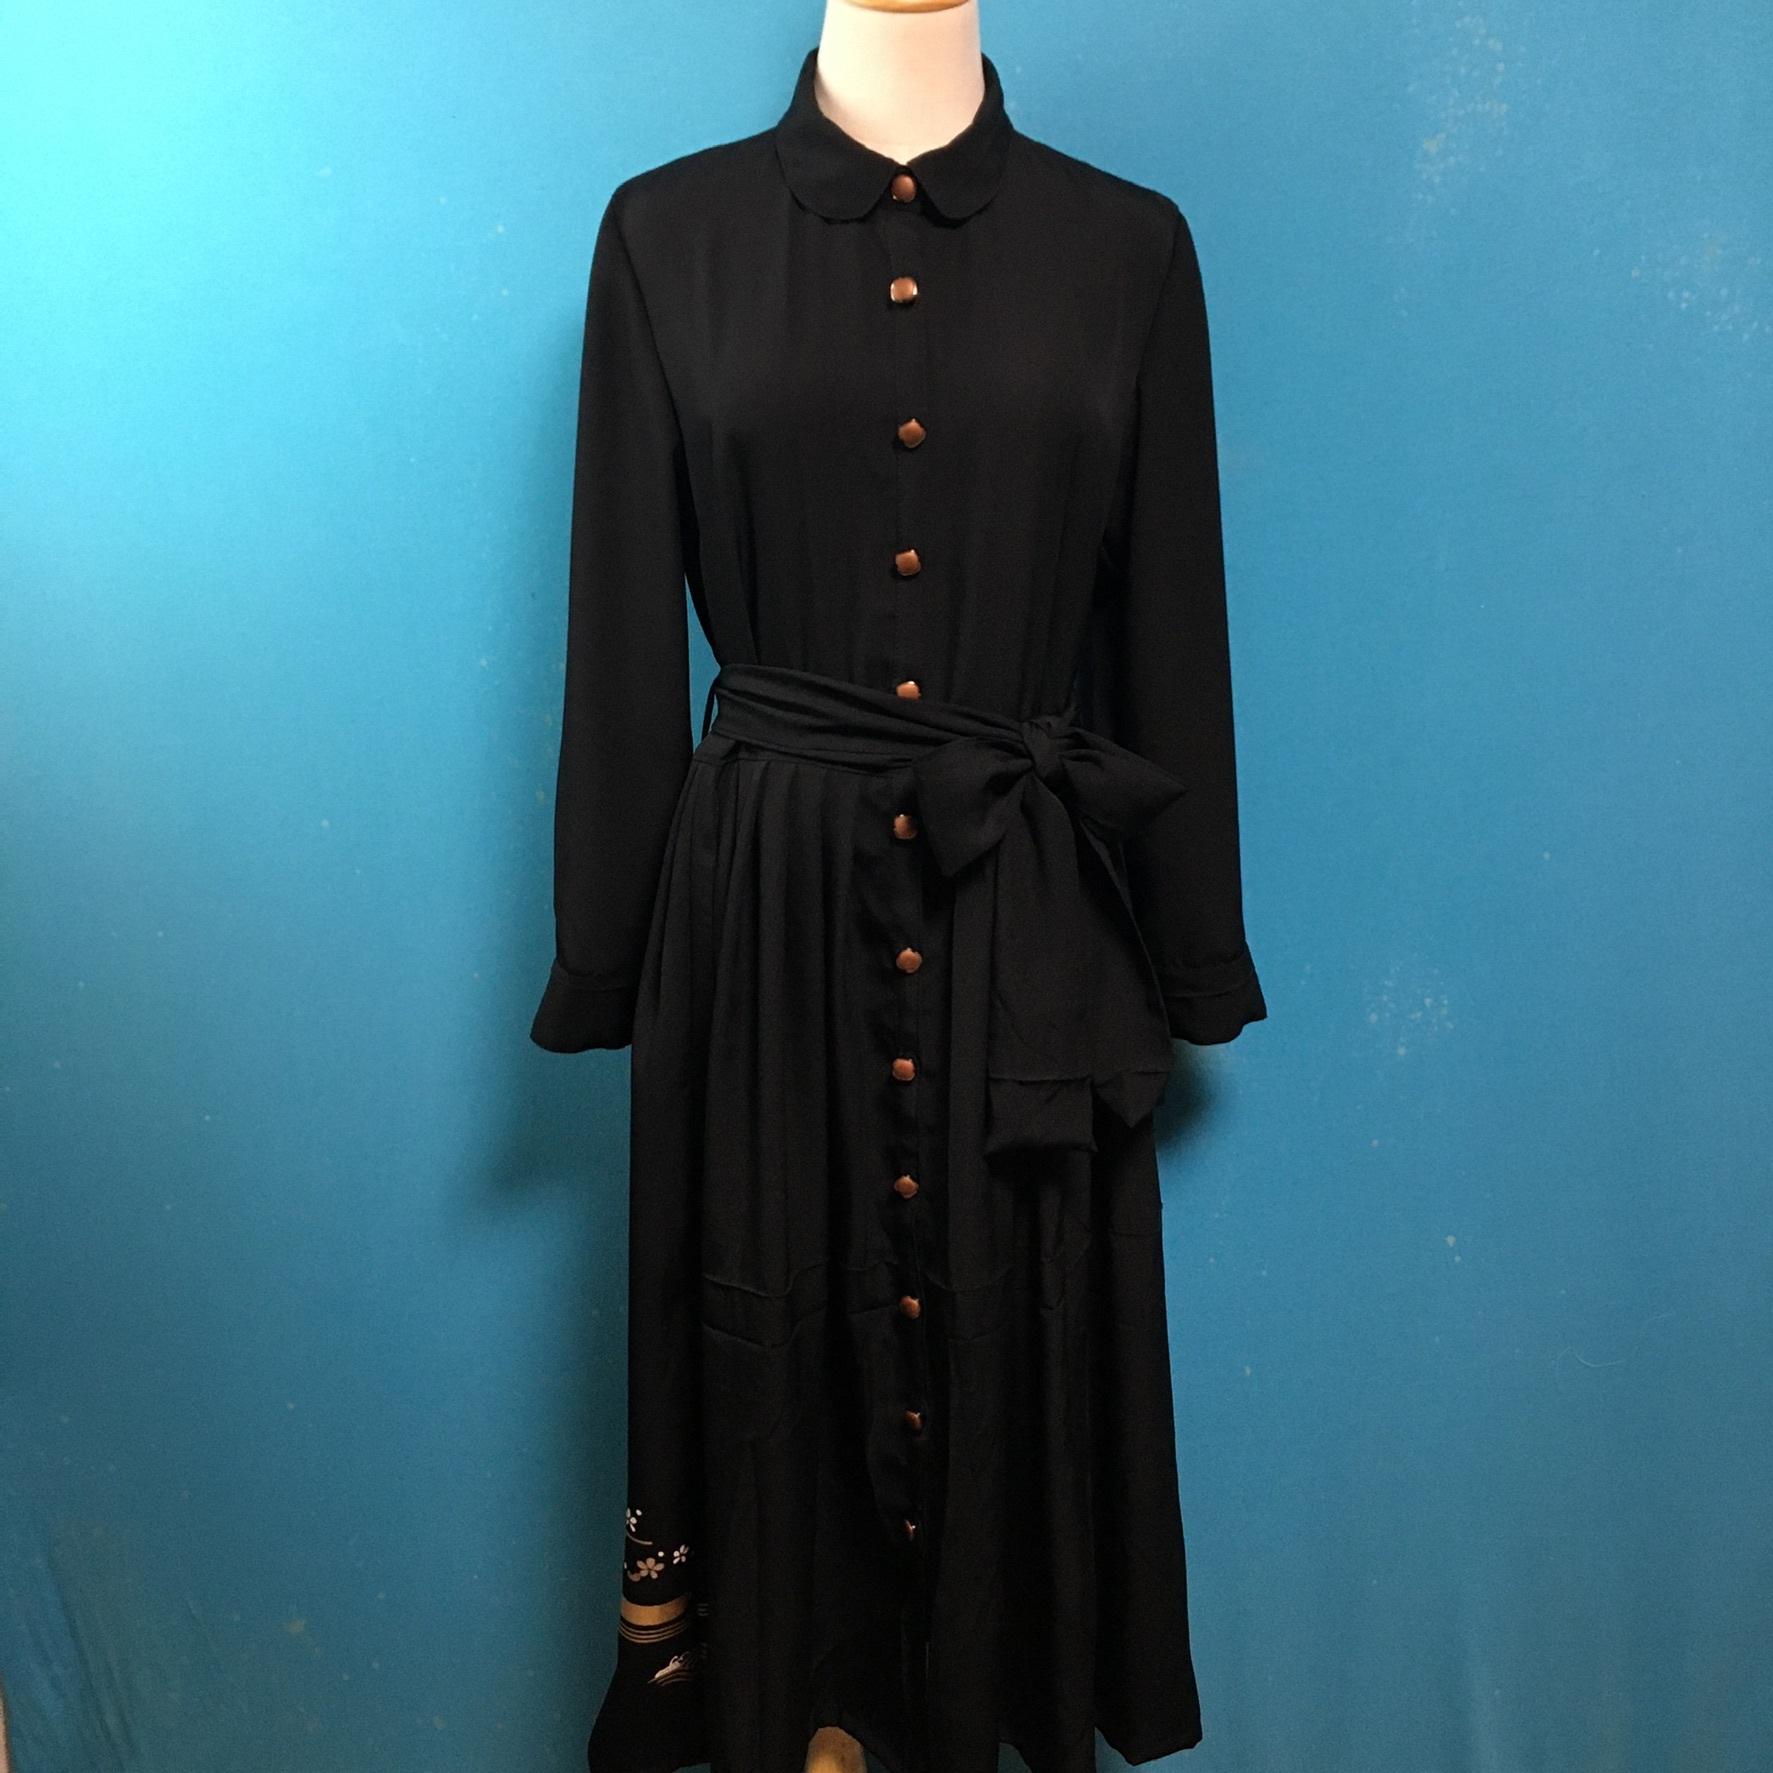 Vintage black kimono dress/ US 8/ round collar